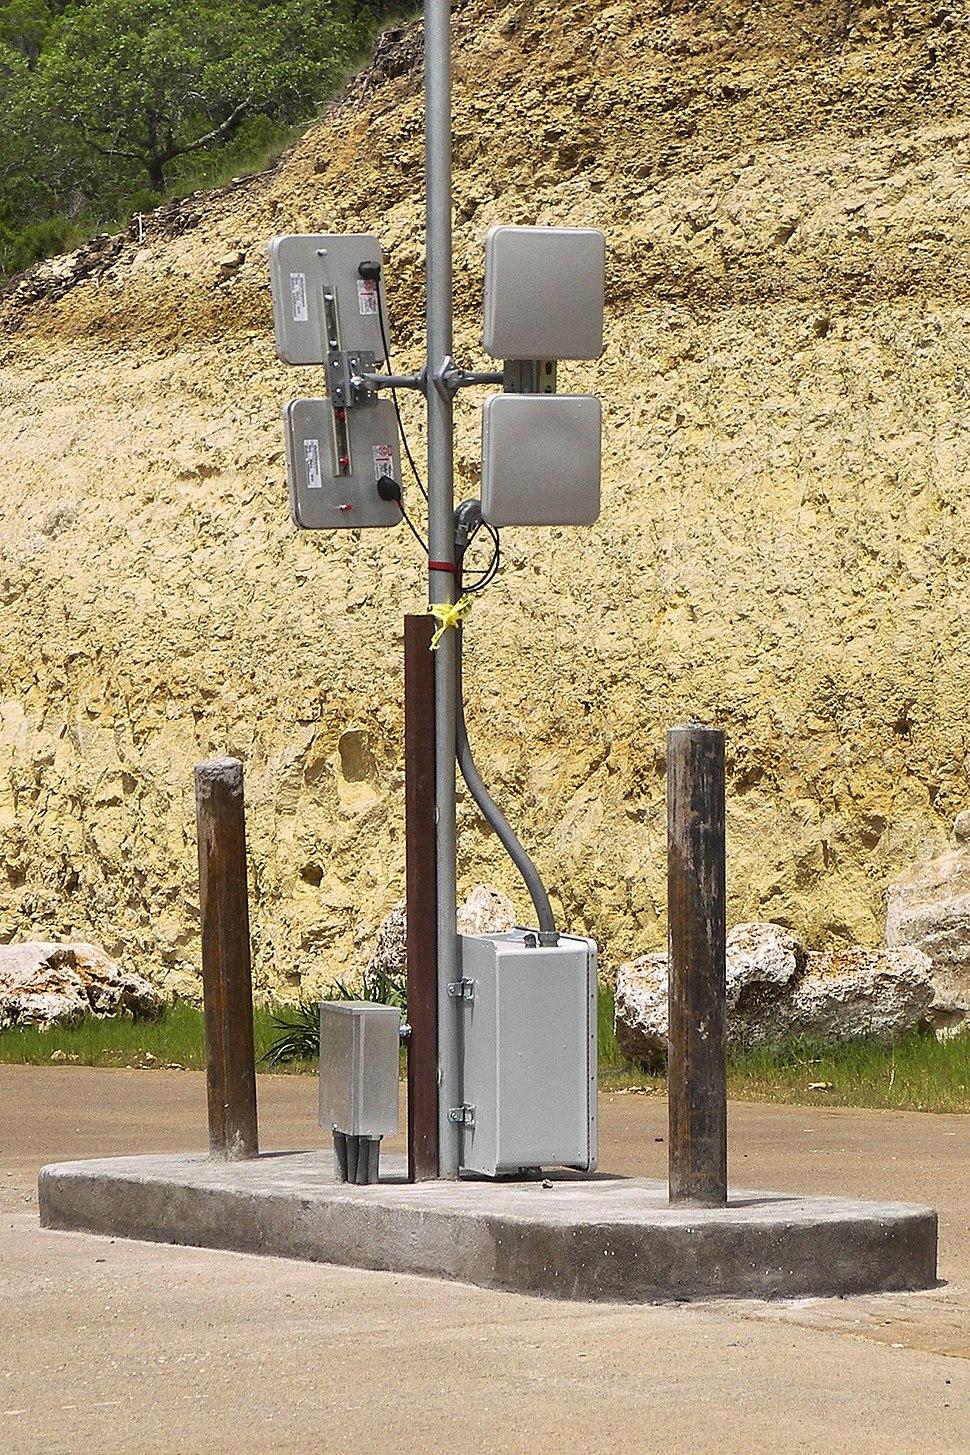 RFID antenna 2007